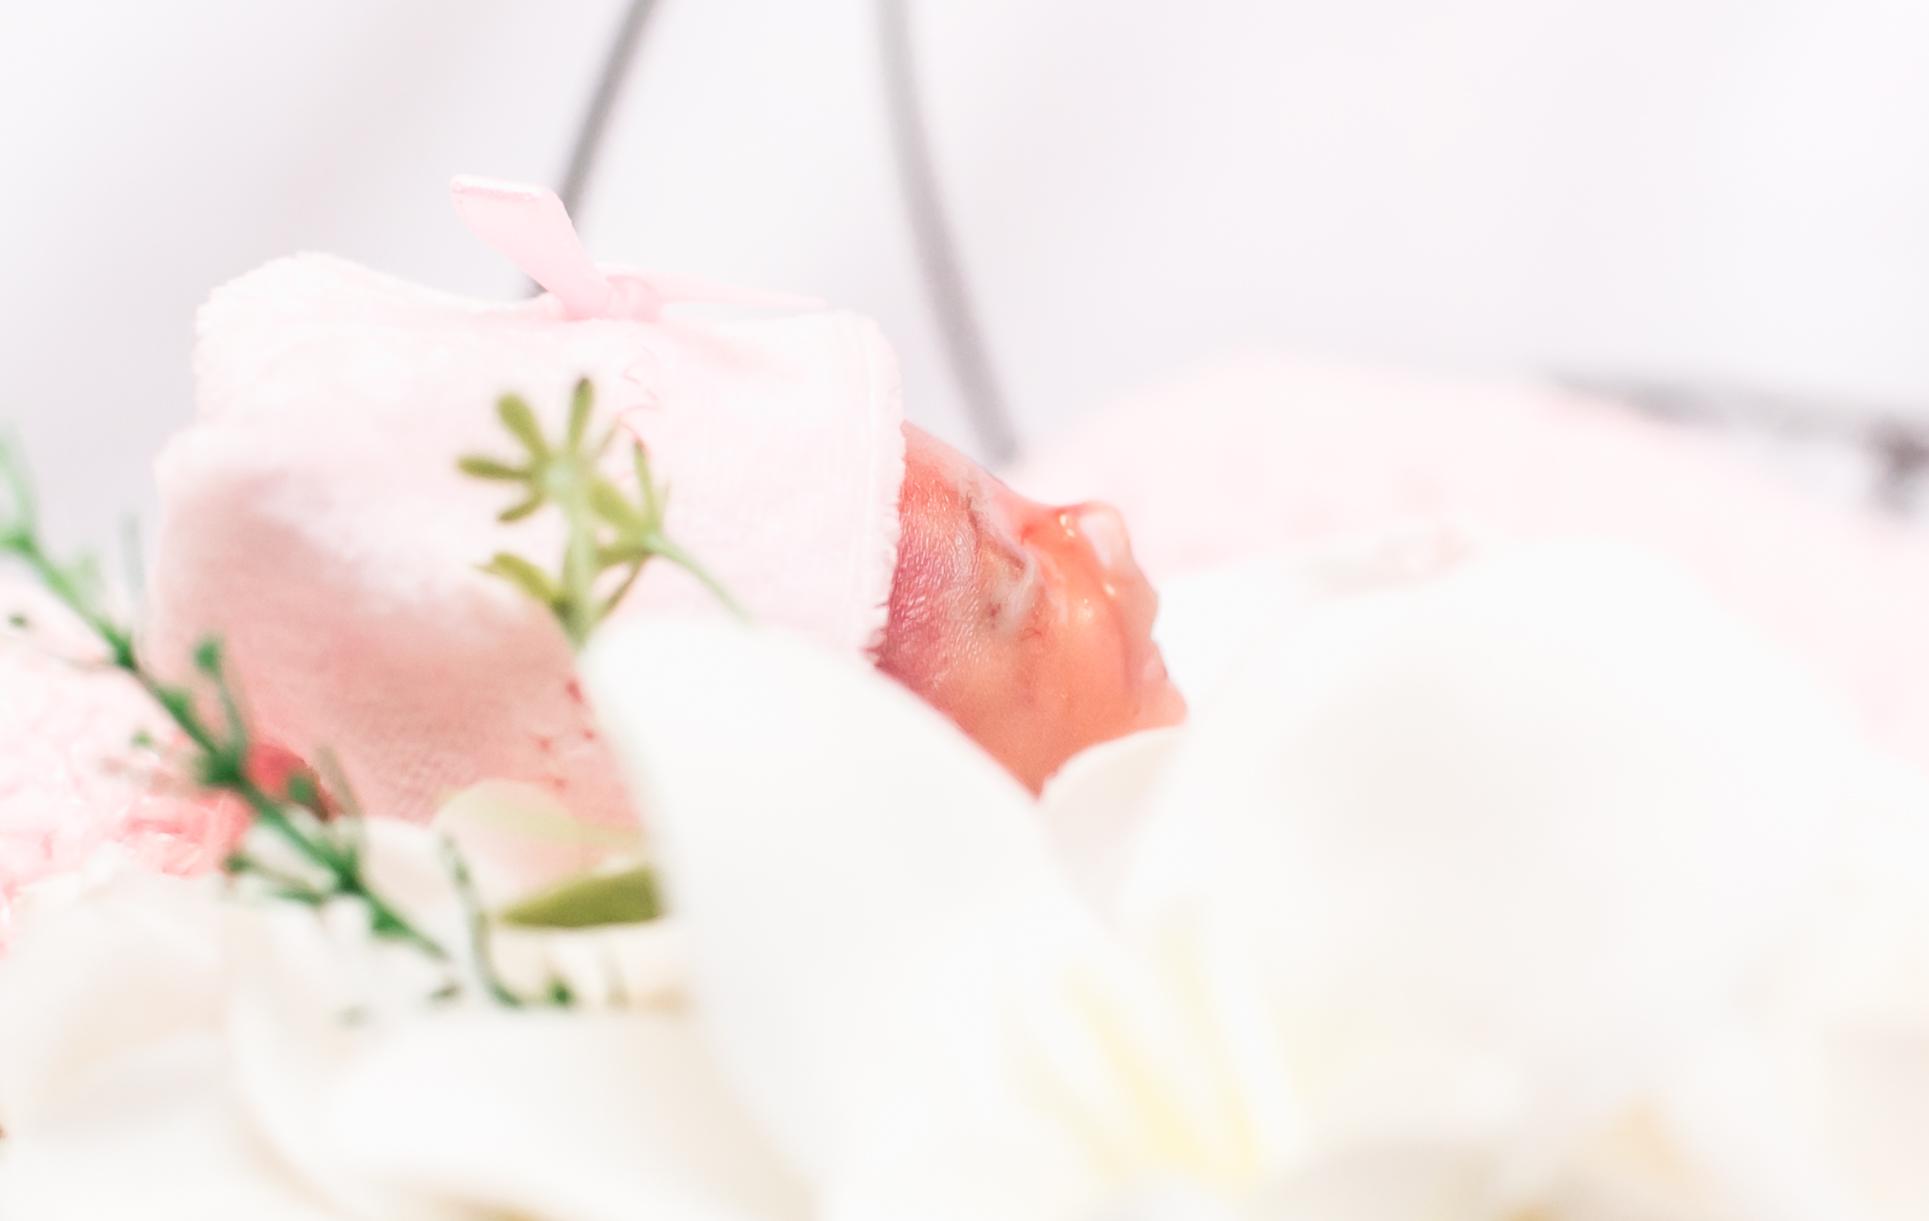 baby-phoenix-18-week-loss-stillbirthday-tarynstarkey-tulsa-ok